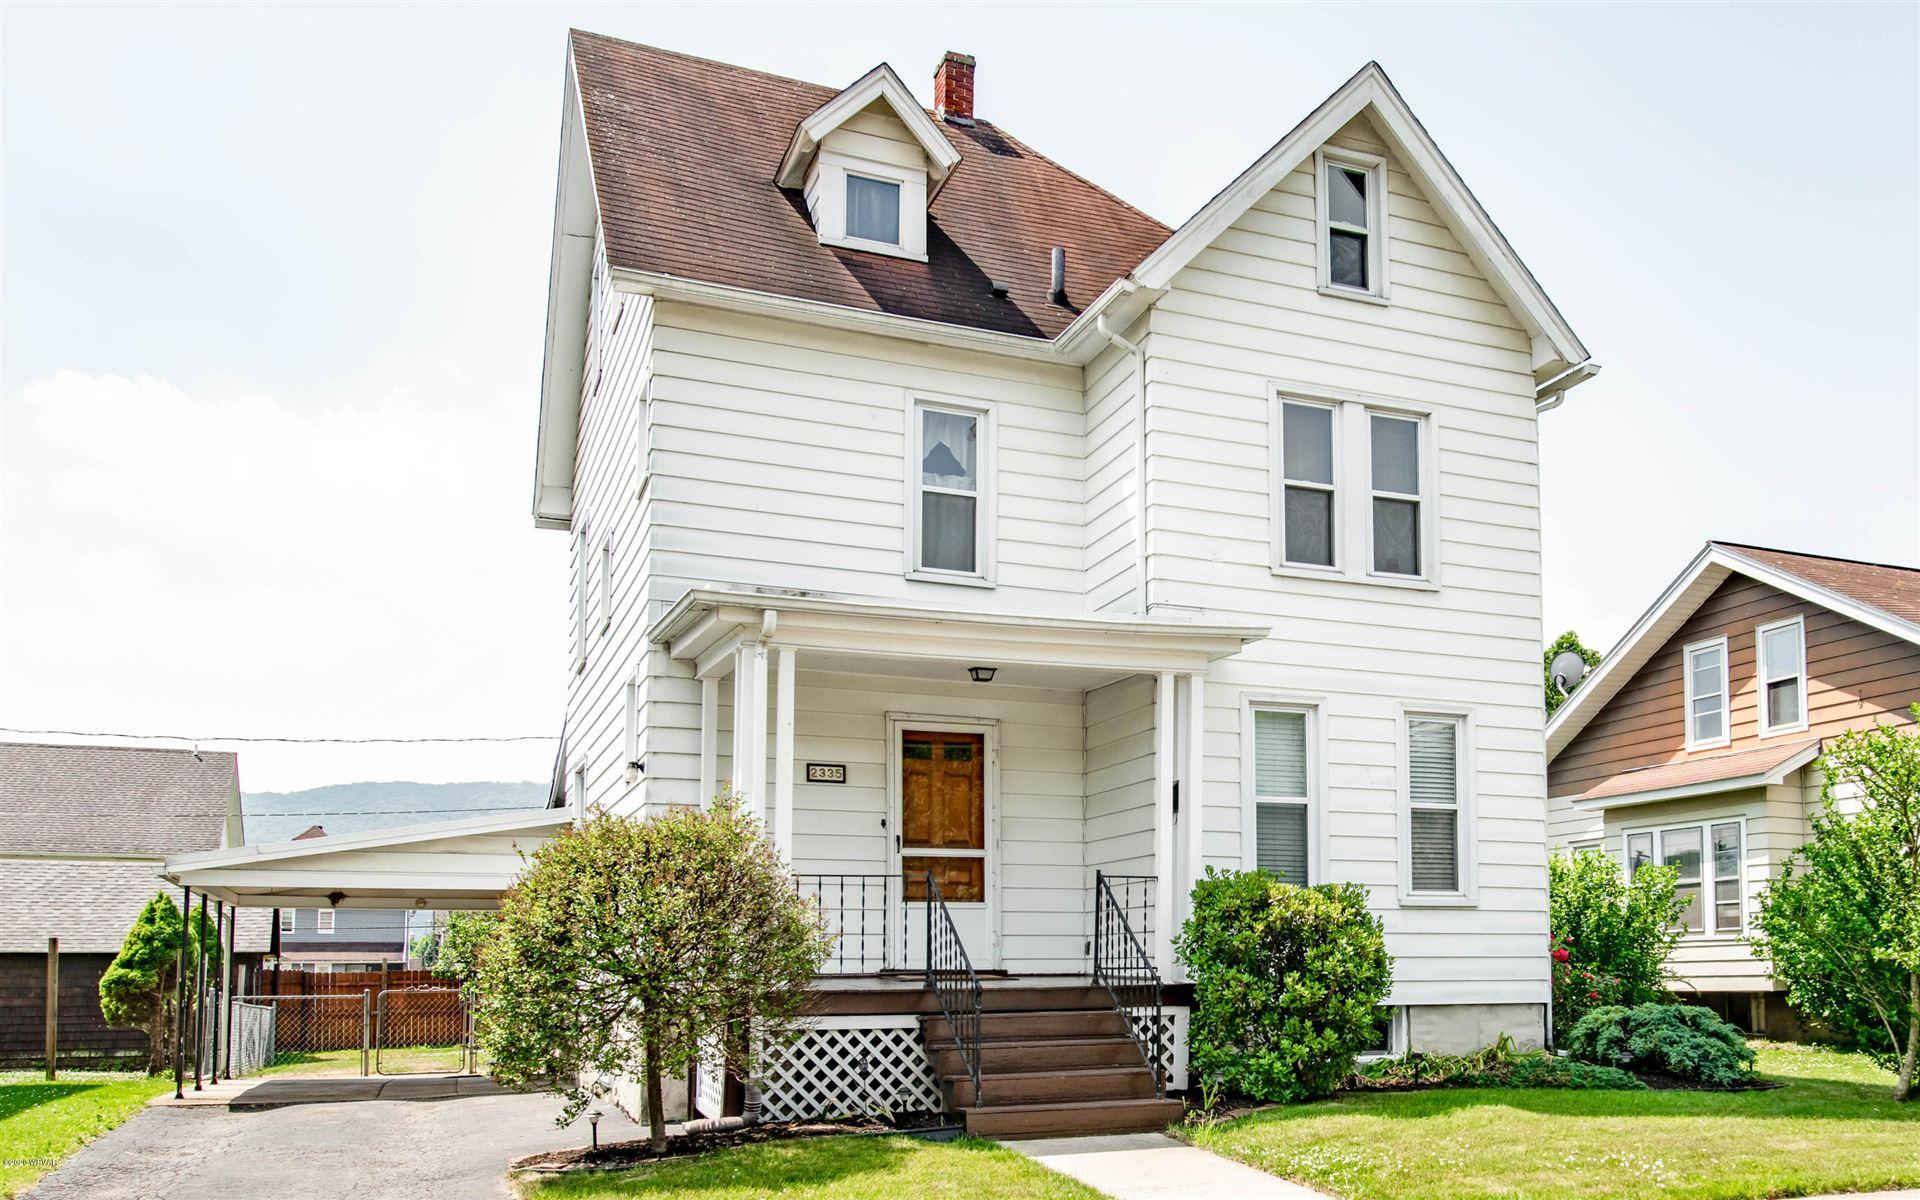 2335 DOVE STREET, Williamsport, PA 17701 - #: WB-90415